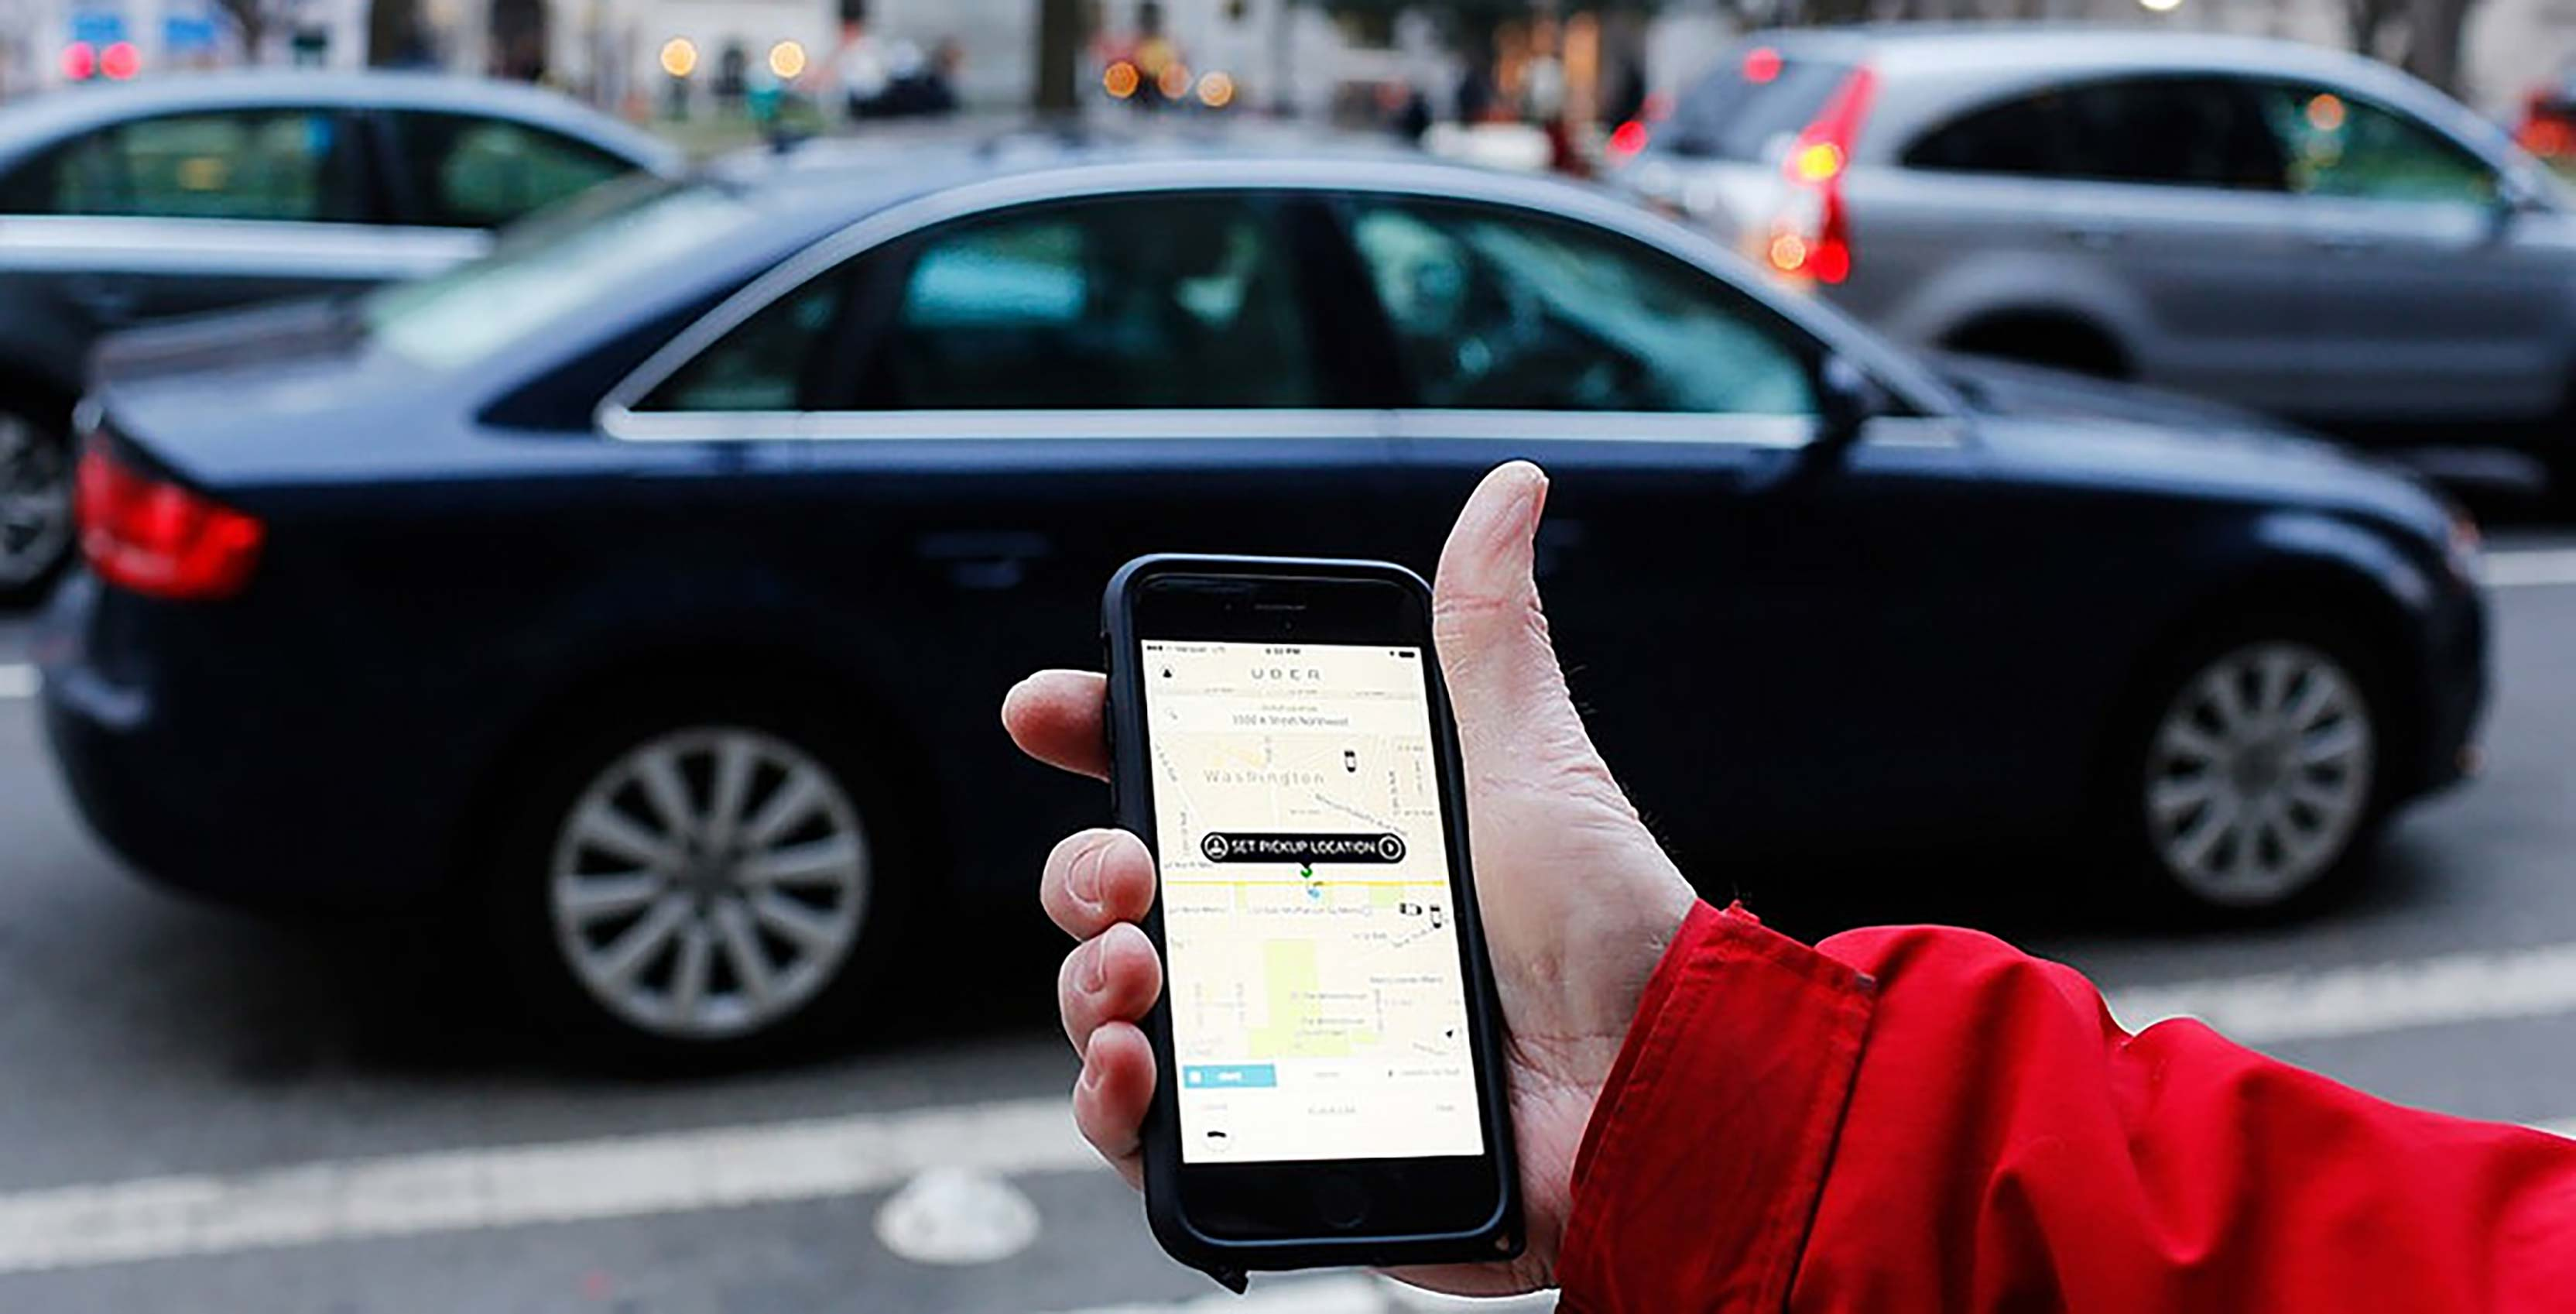 Uber app on phone car pickup